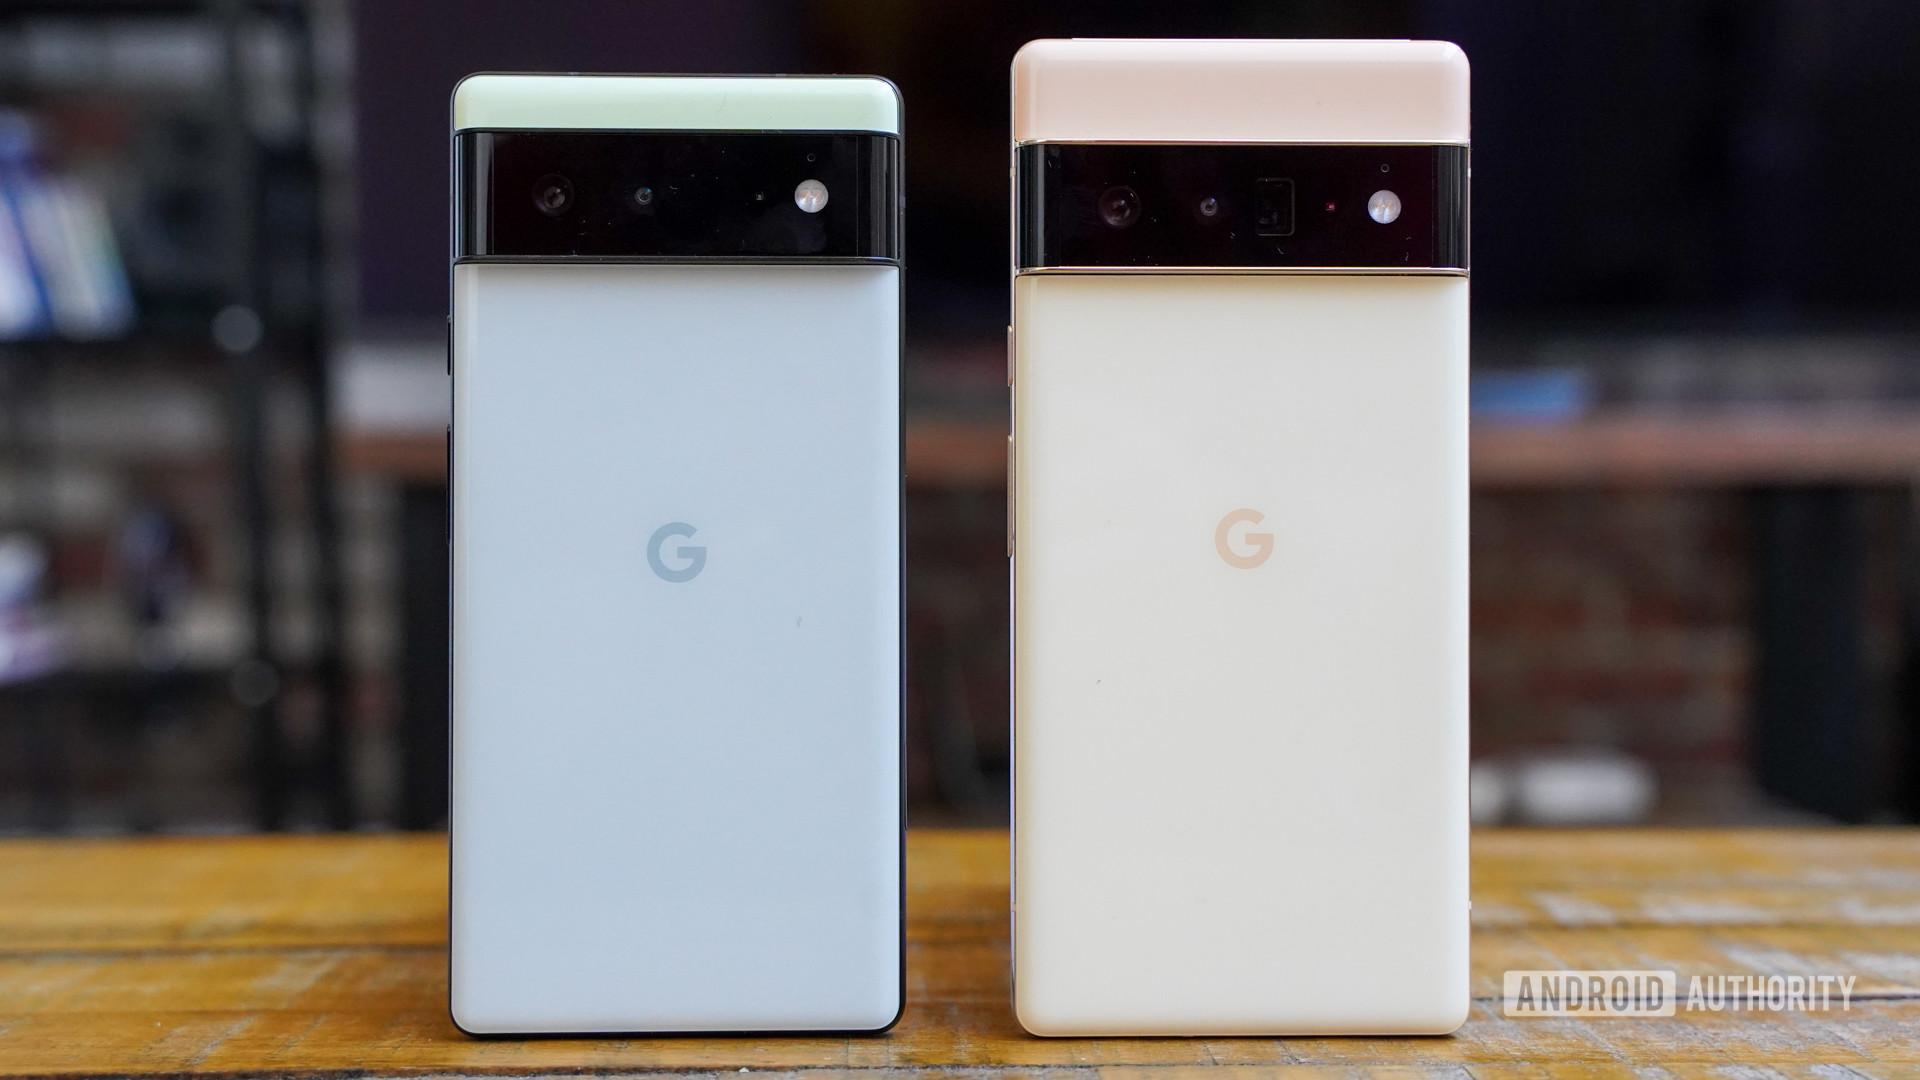 Google Pixel 6 and Pixel 6 Pro rear panels